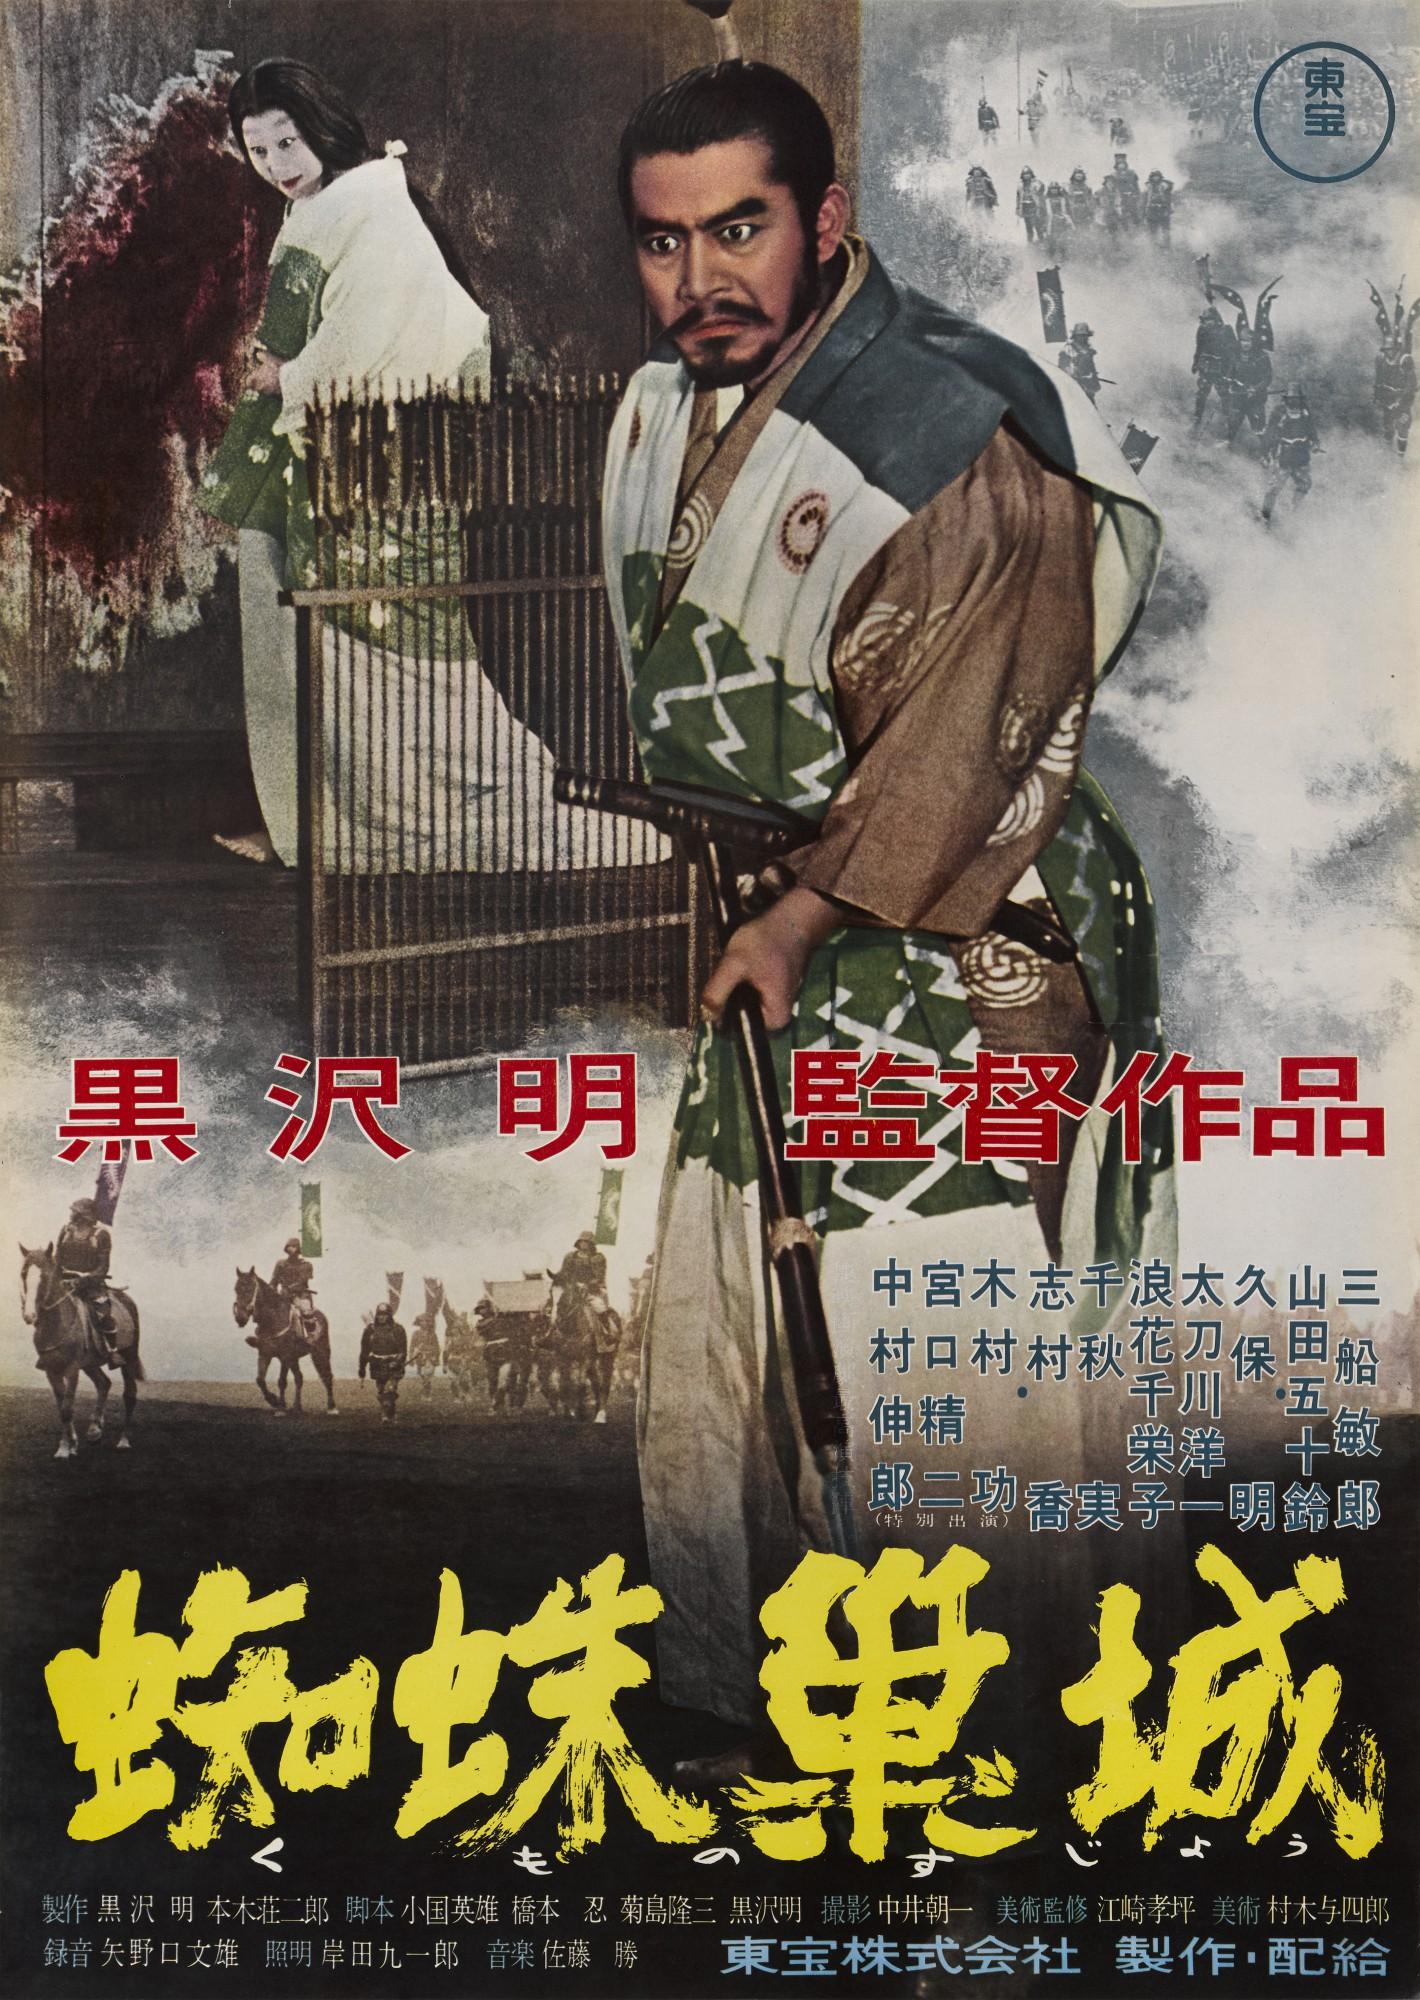 KUMONOSO/THRONE OF BLOOD (1957) POSTER, JAPANESE